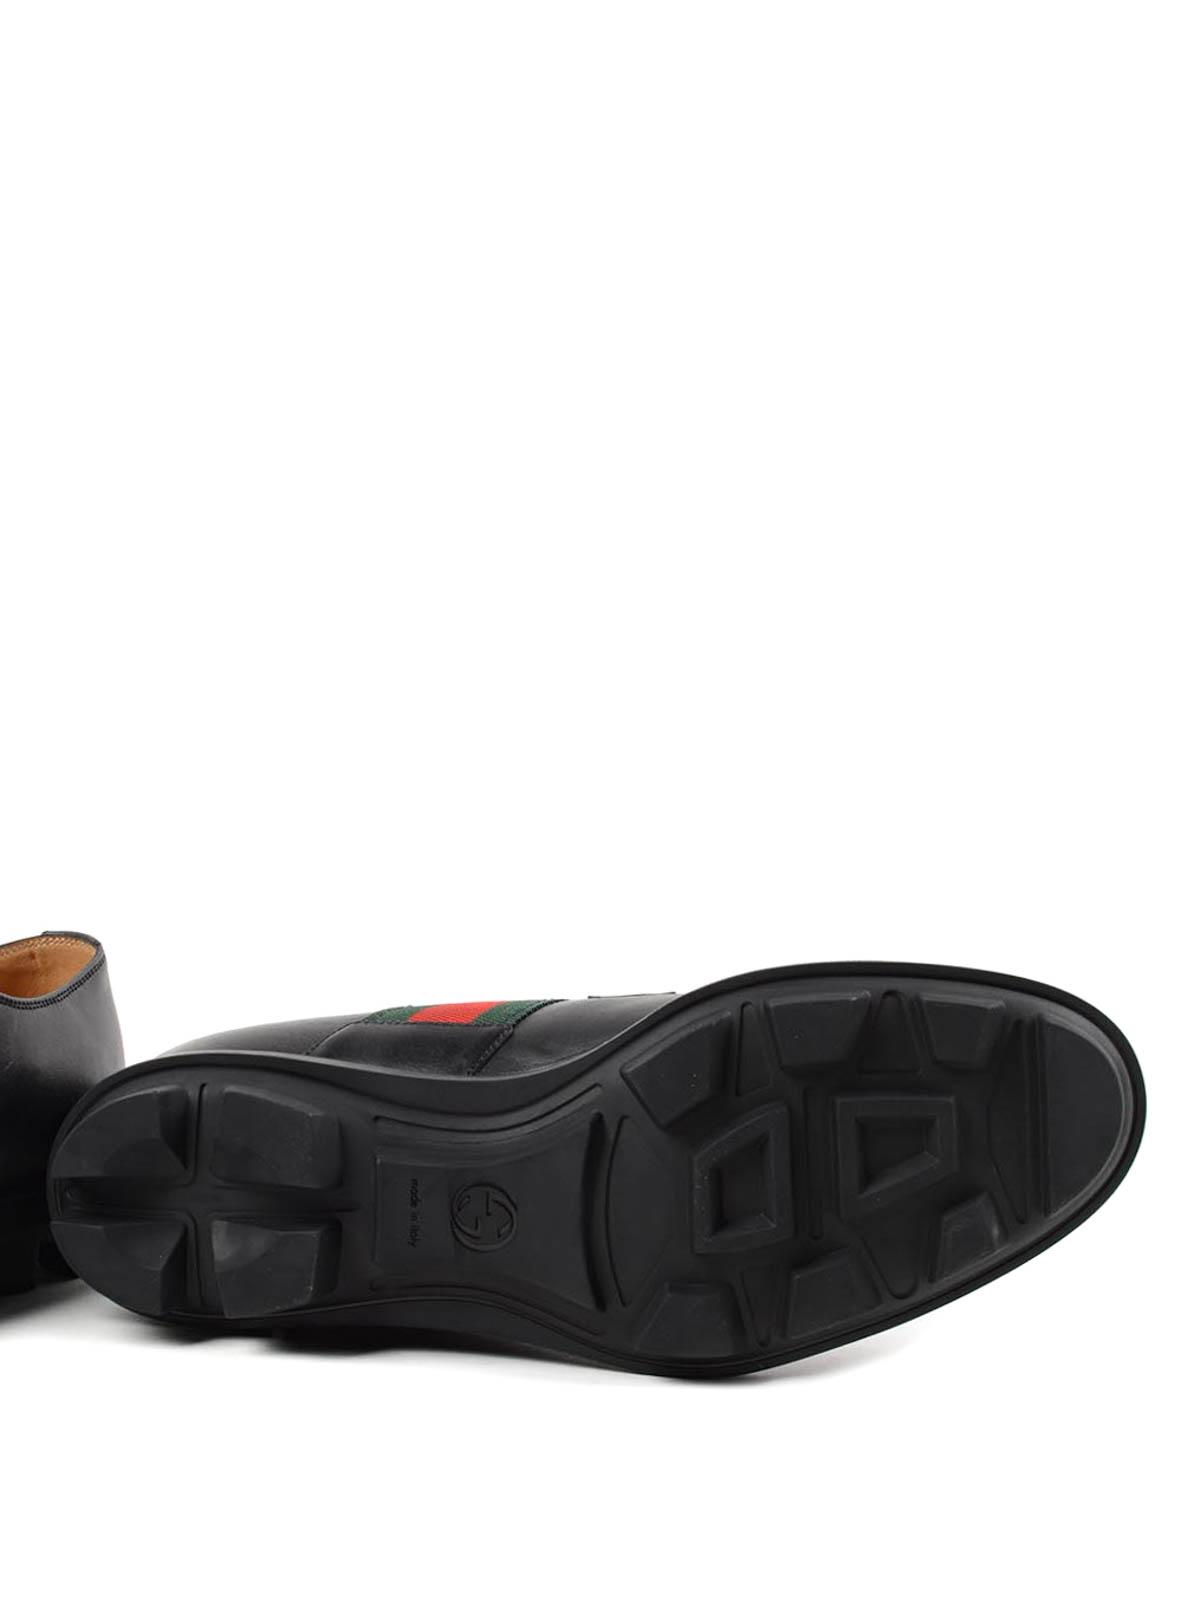 e1137bc11 Gucci - Zapatos Con Cordones Negros - Zapatos con cordones ...